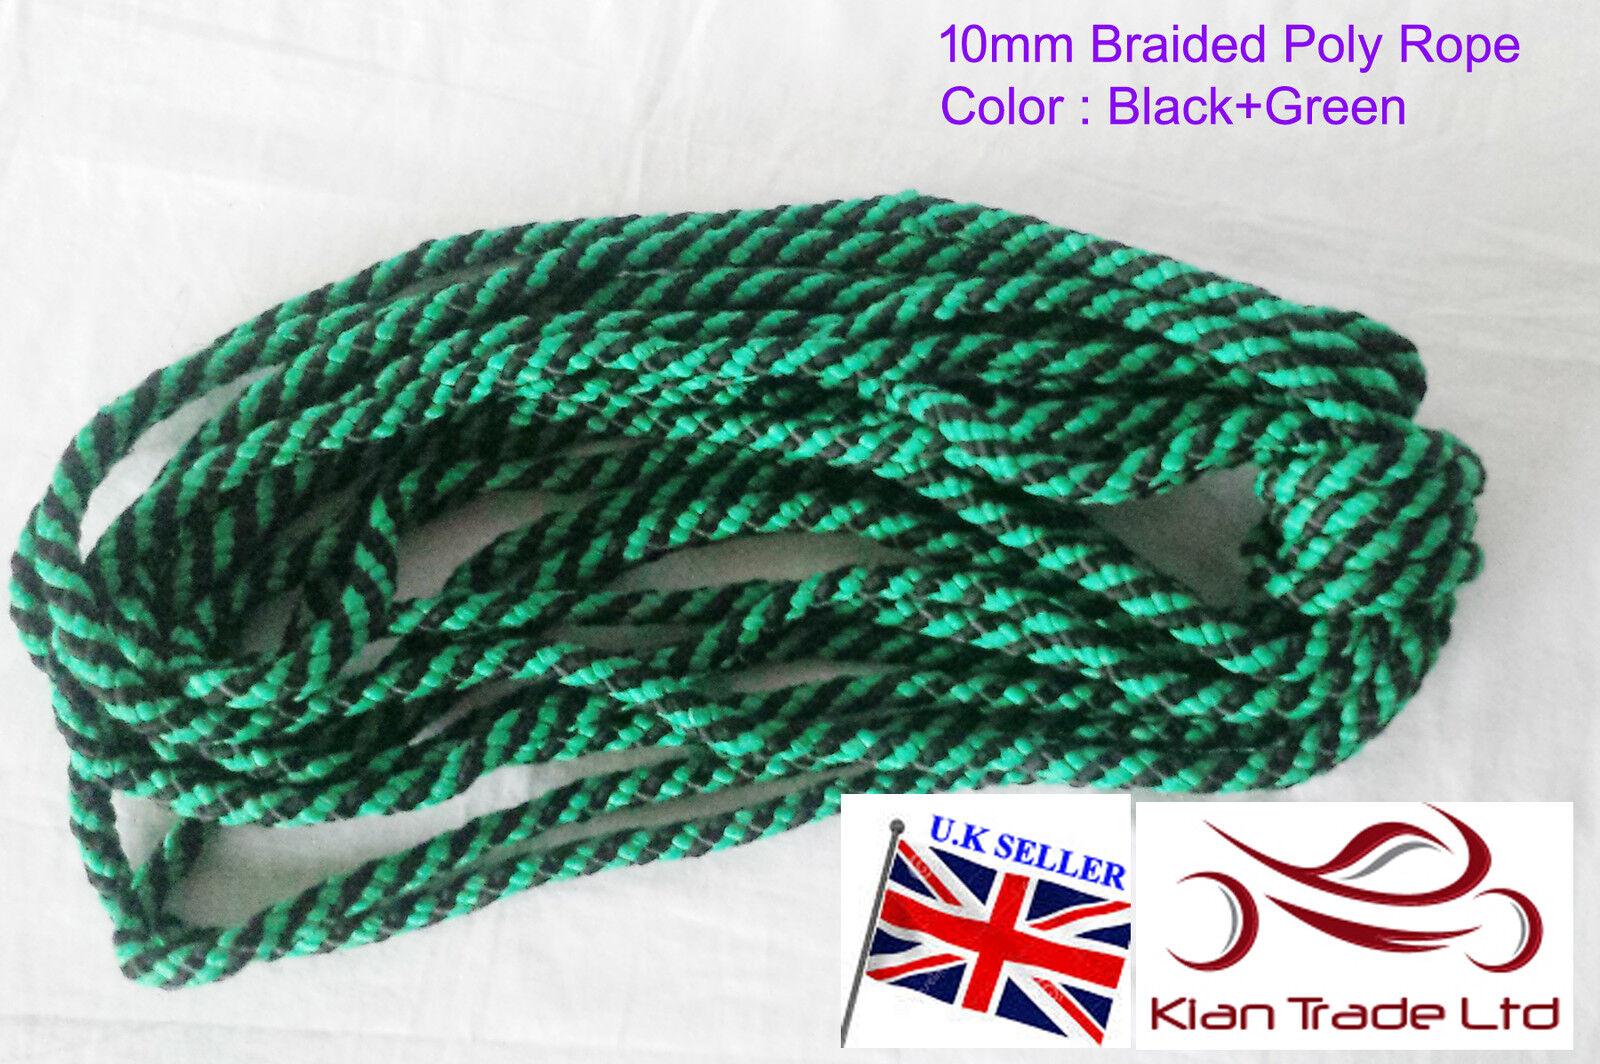 10mm schwarz grün Poly Seil Yacht Segel Segel Segel Camping Stiefel Aufstieg Marine Garten 6eff7e